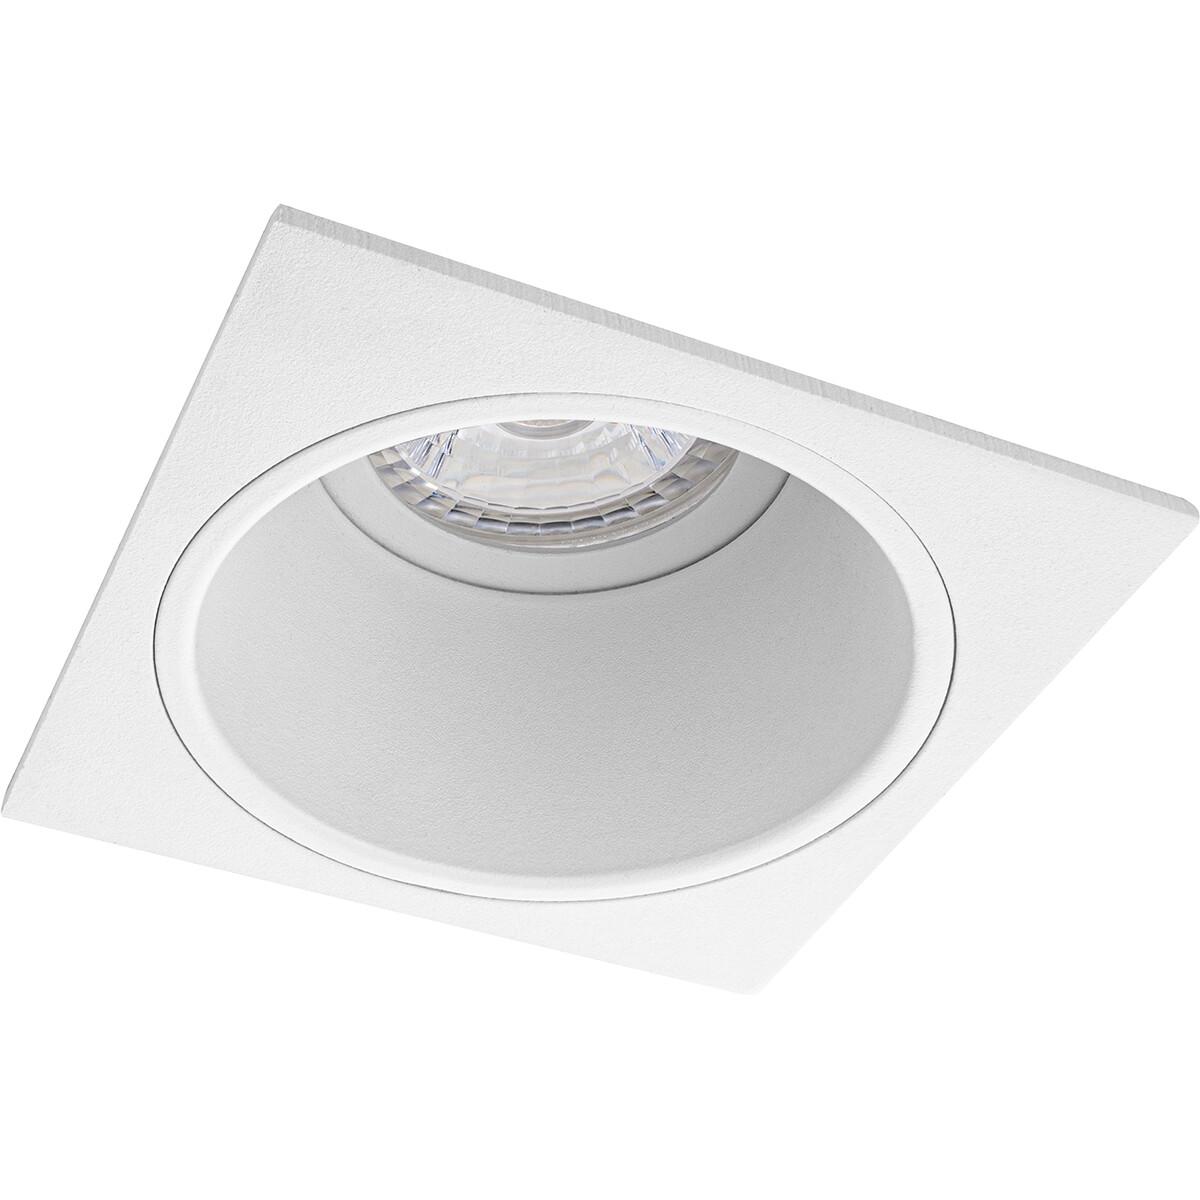 Spot Armatuur GU10 - Pragmi Minko Pro - Inbouw Vierkant - Mat Wit - Aluminium - Verdiept - 90mm